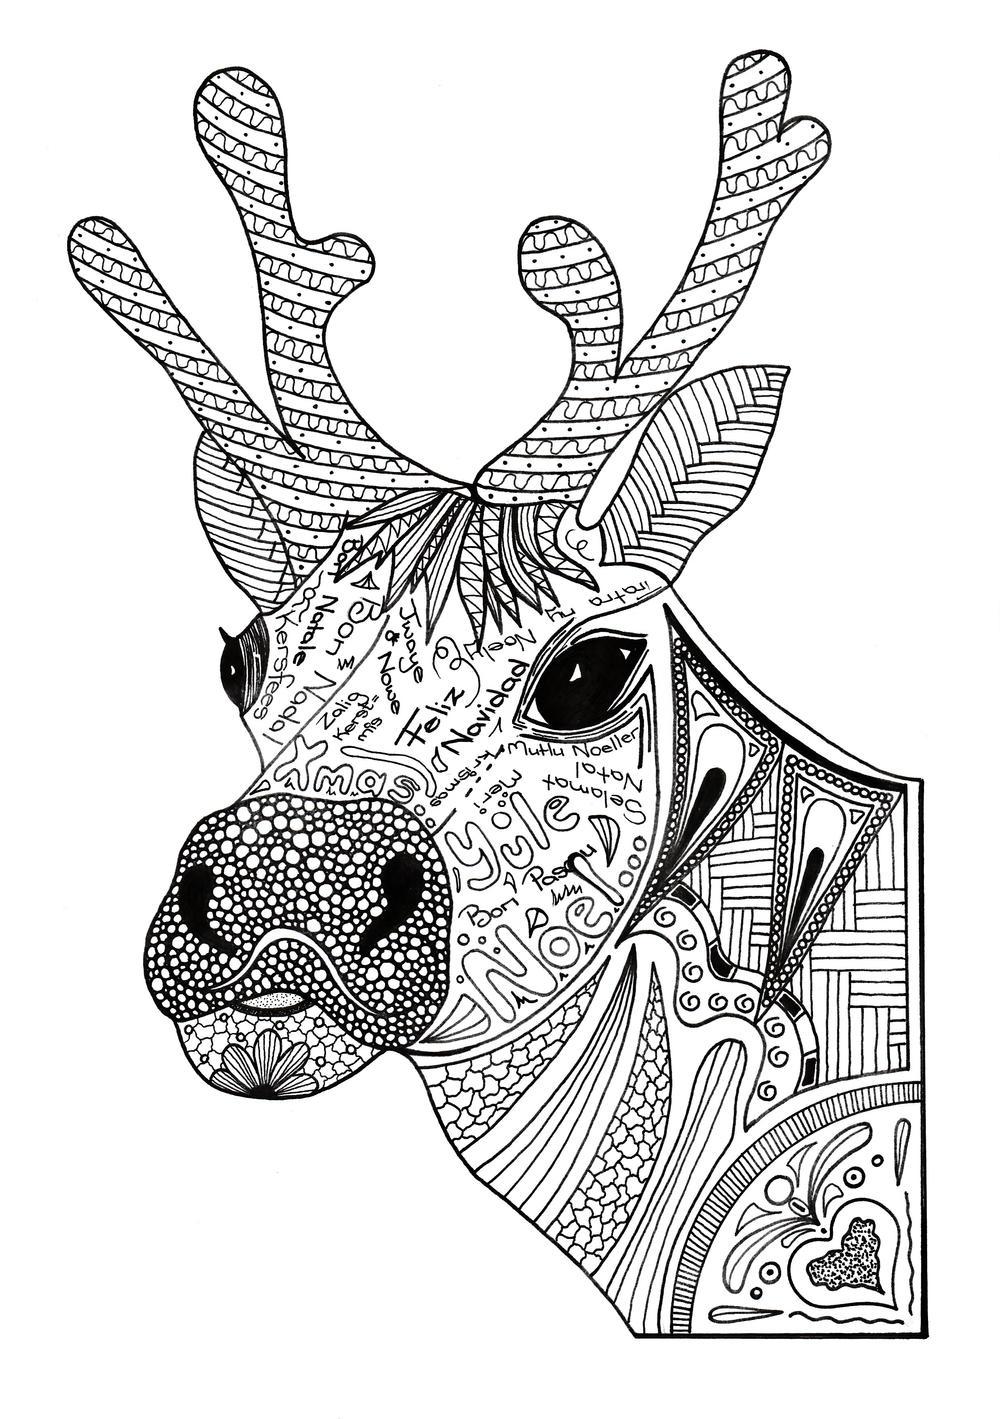 Christmas Reindeer Adult Coloring Page | FaveCrafts.com | christmas colouring pages for adults